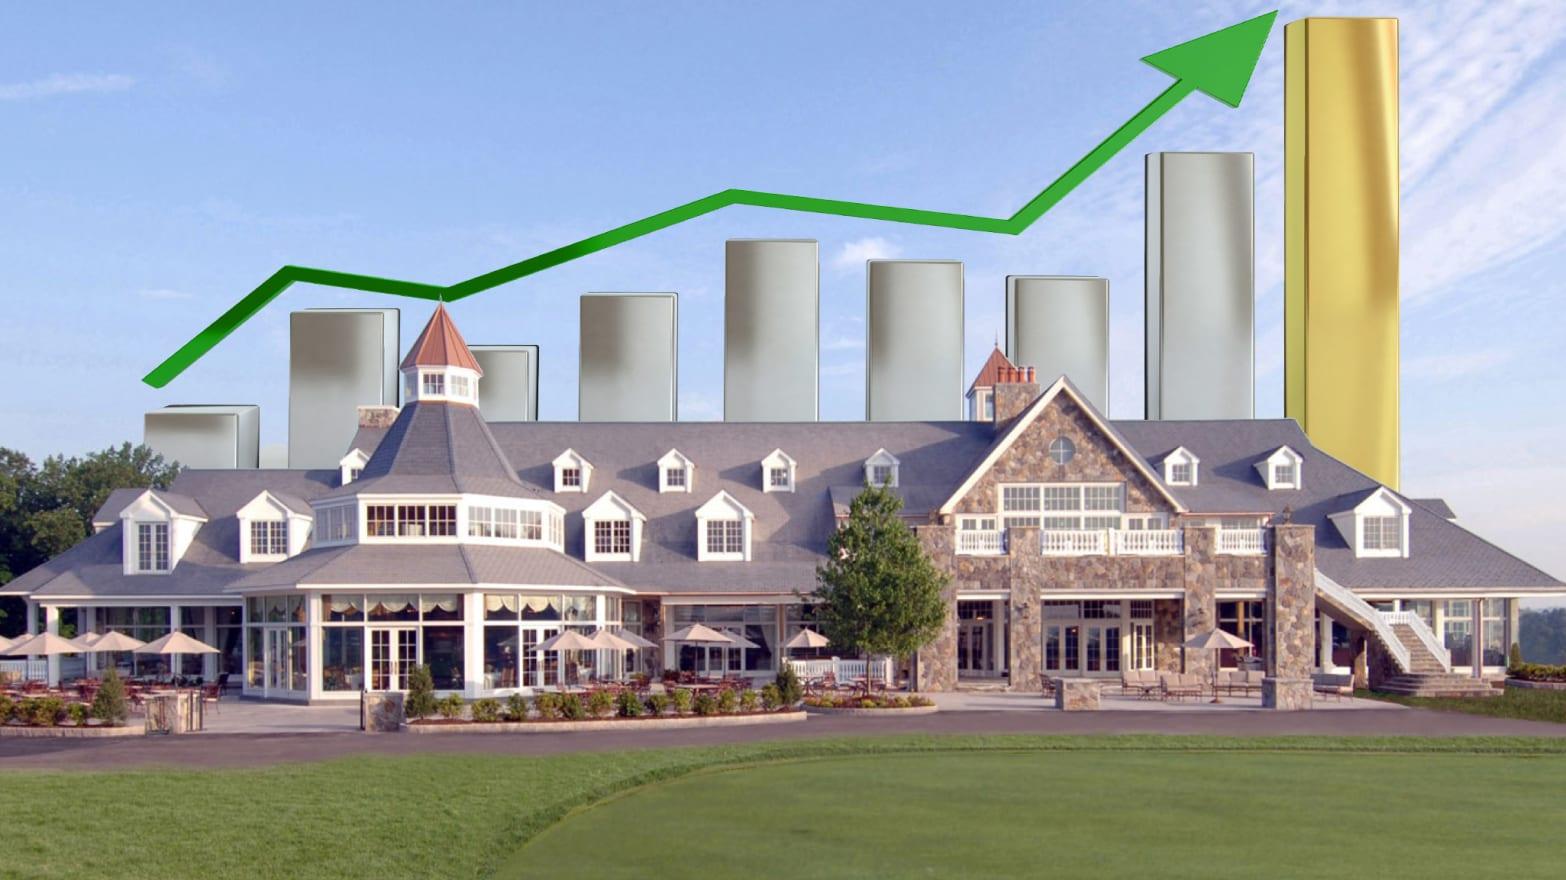 Donald Trump's Worthless Real Estate Math